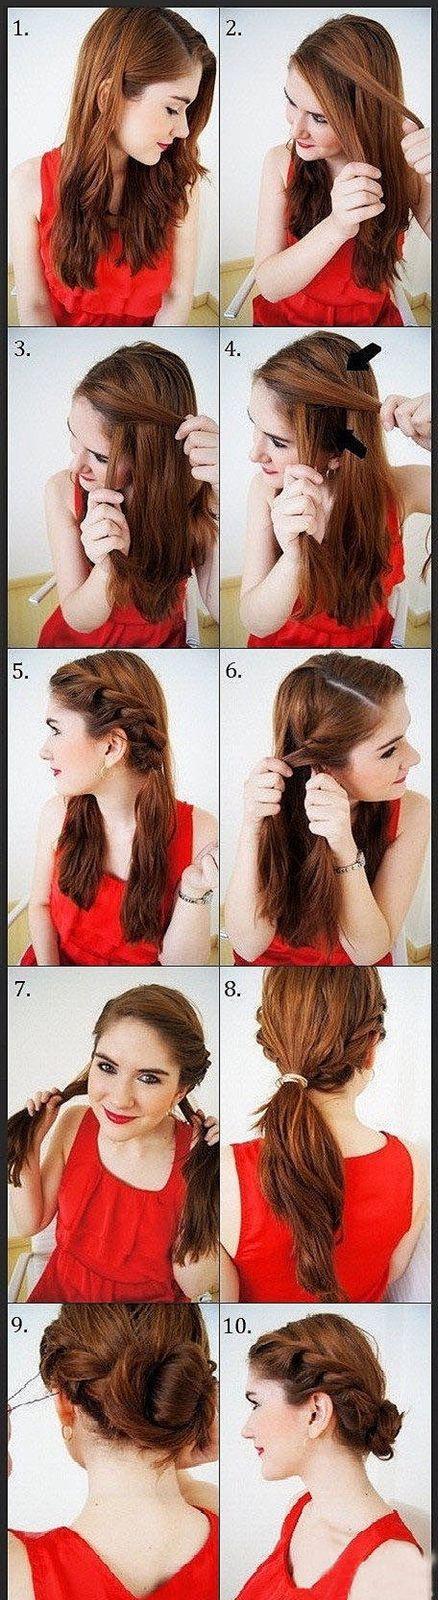 hair styles for long hair hairstyles